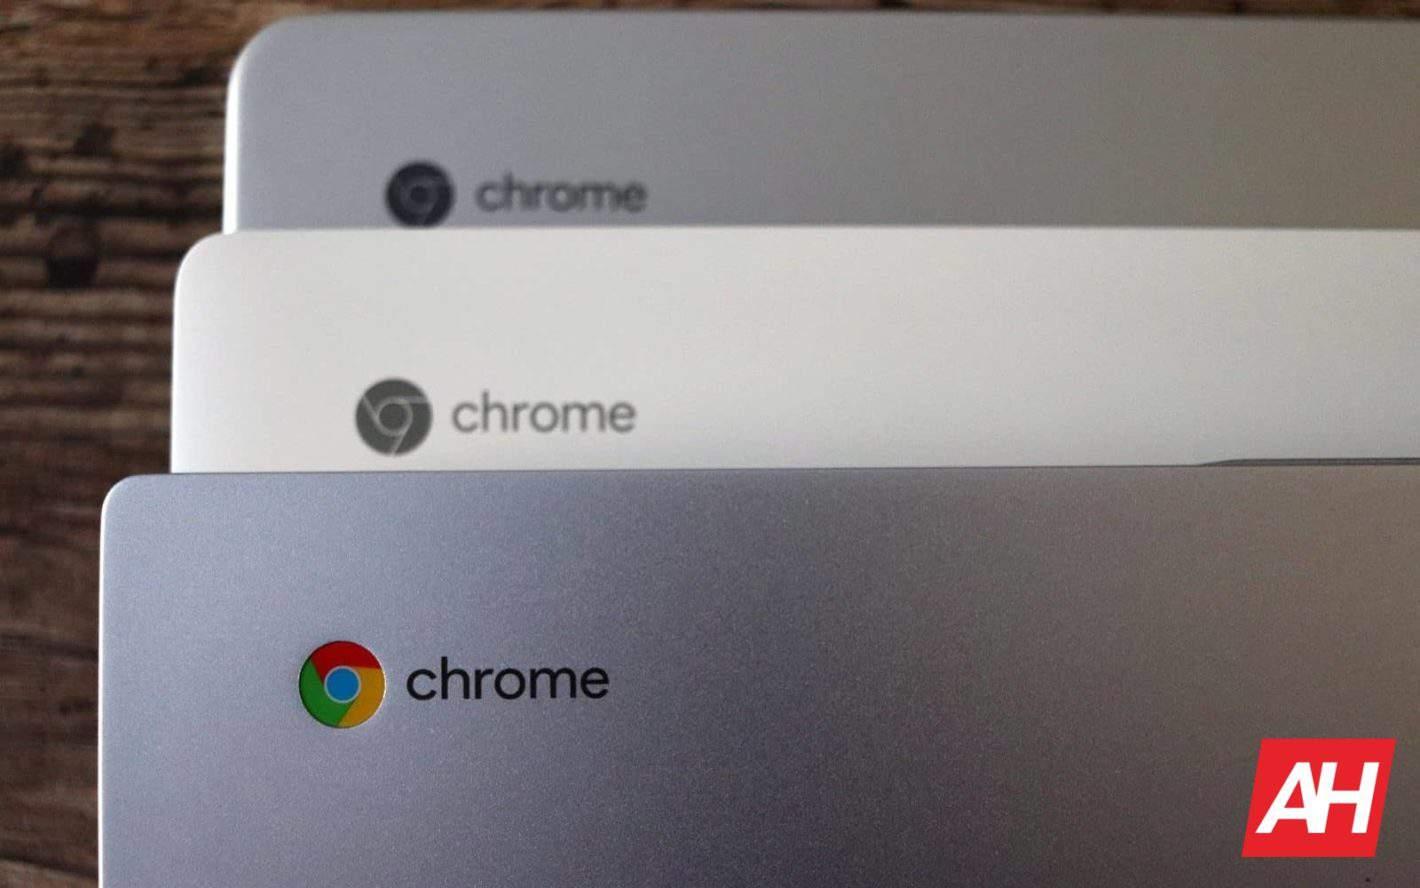 Chrome OS Title Image 03 DG AH 2019